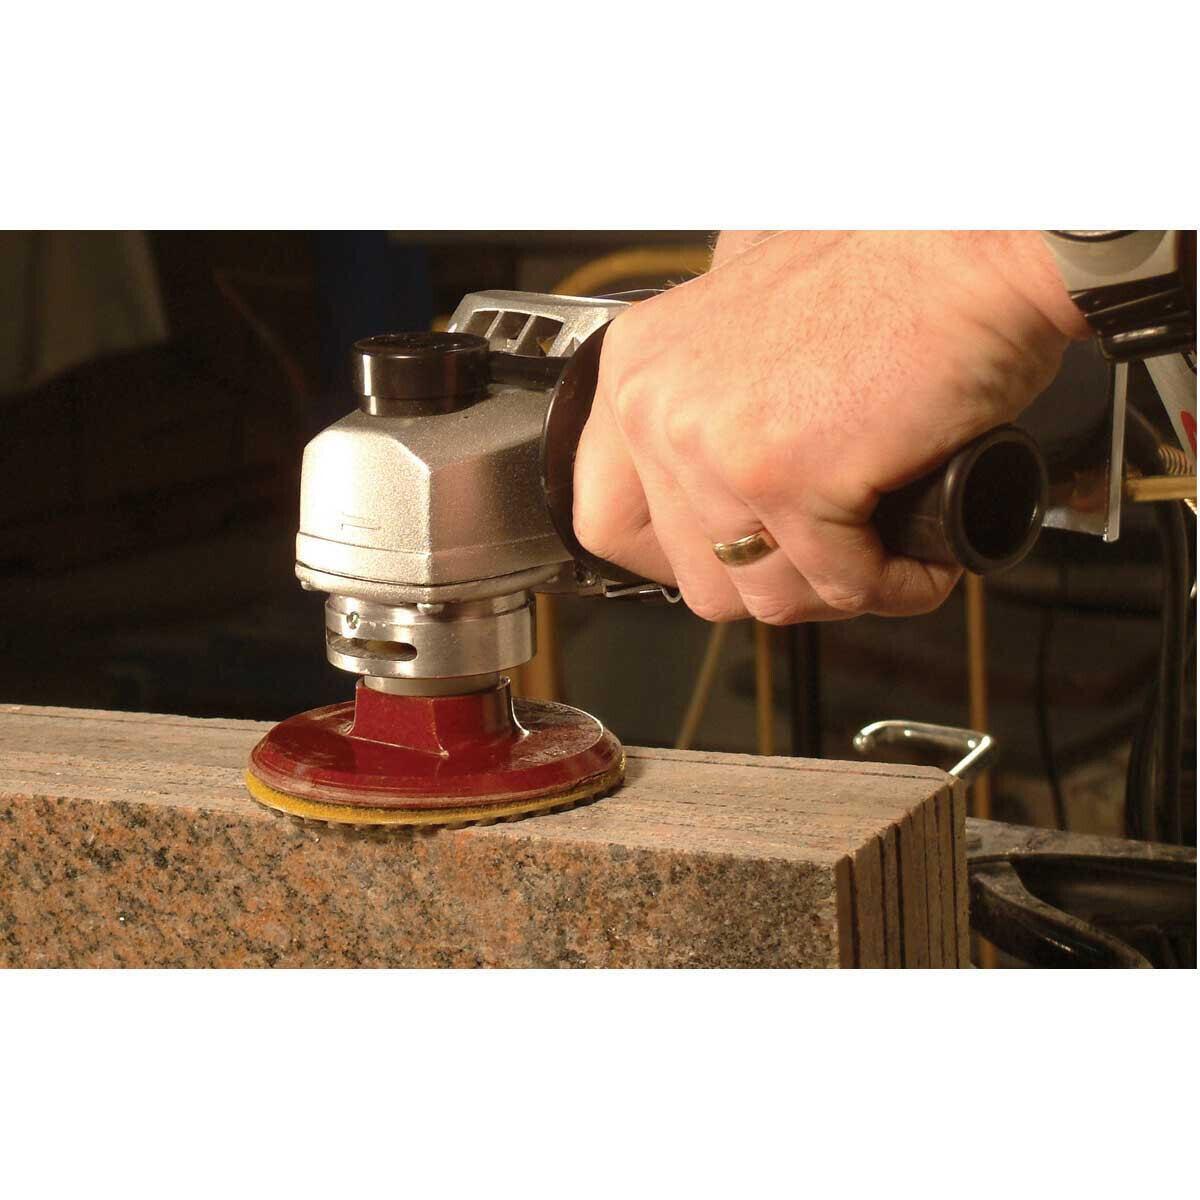 Alpha Hook and Loop Backer Pad for Polishing Granite